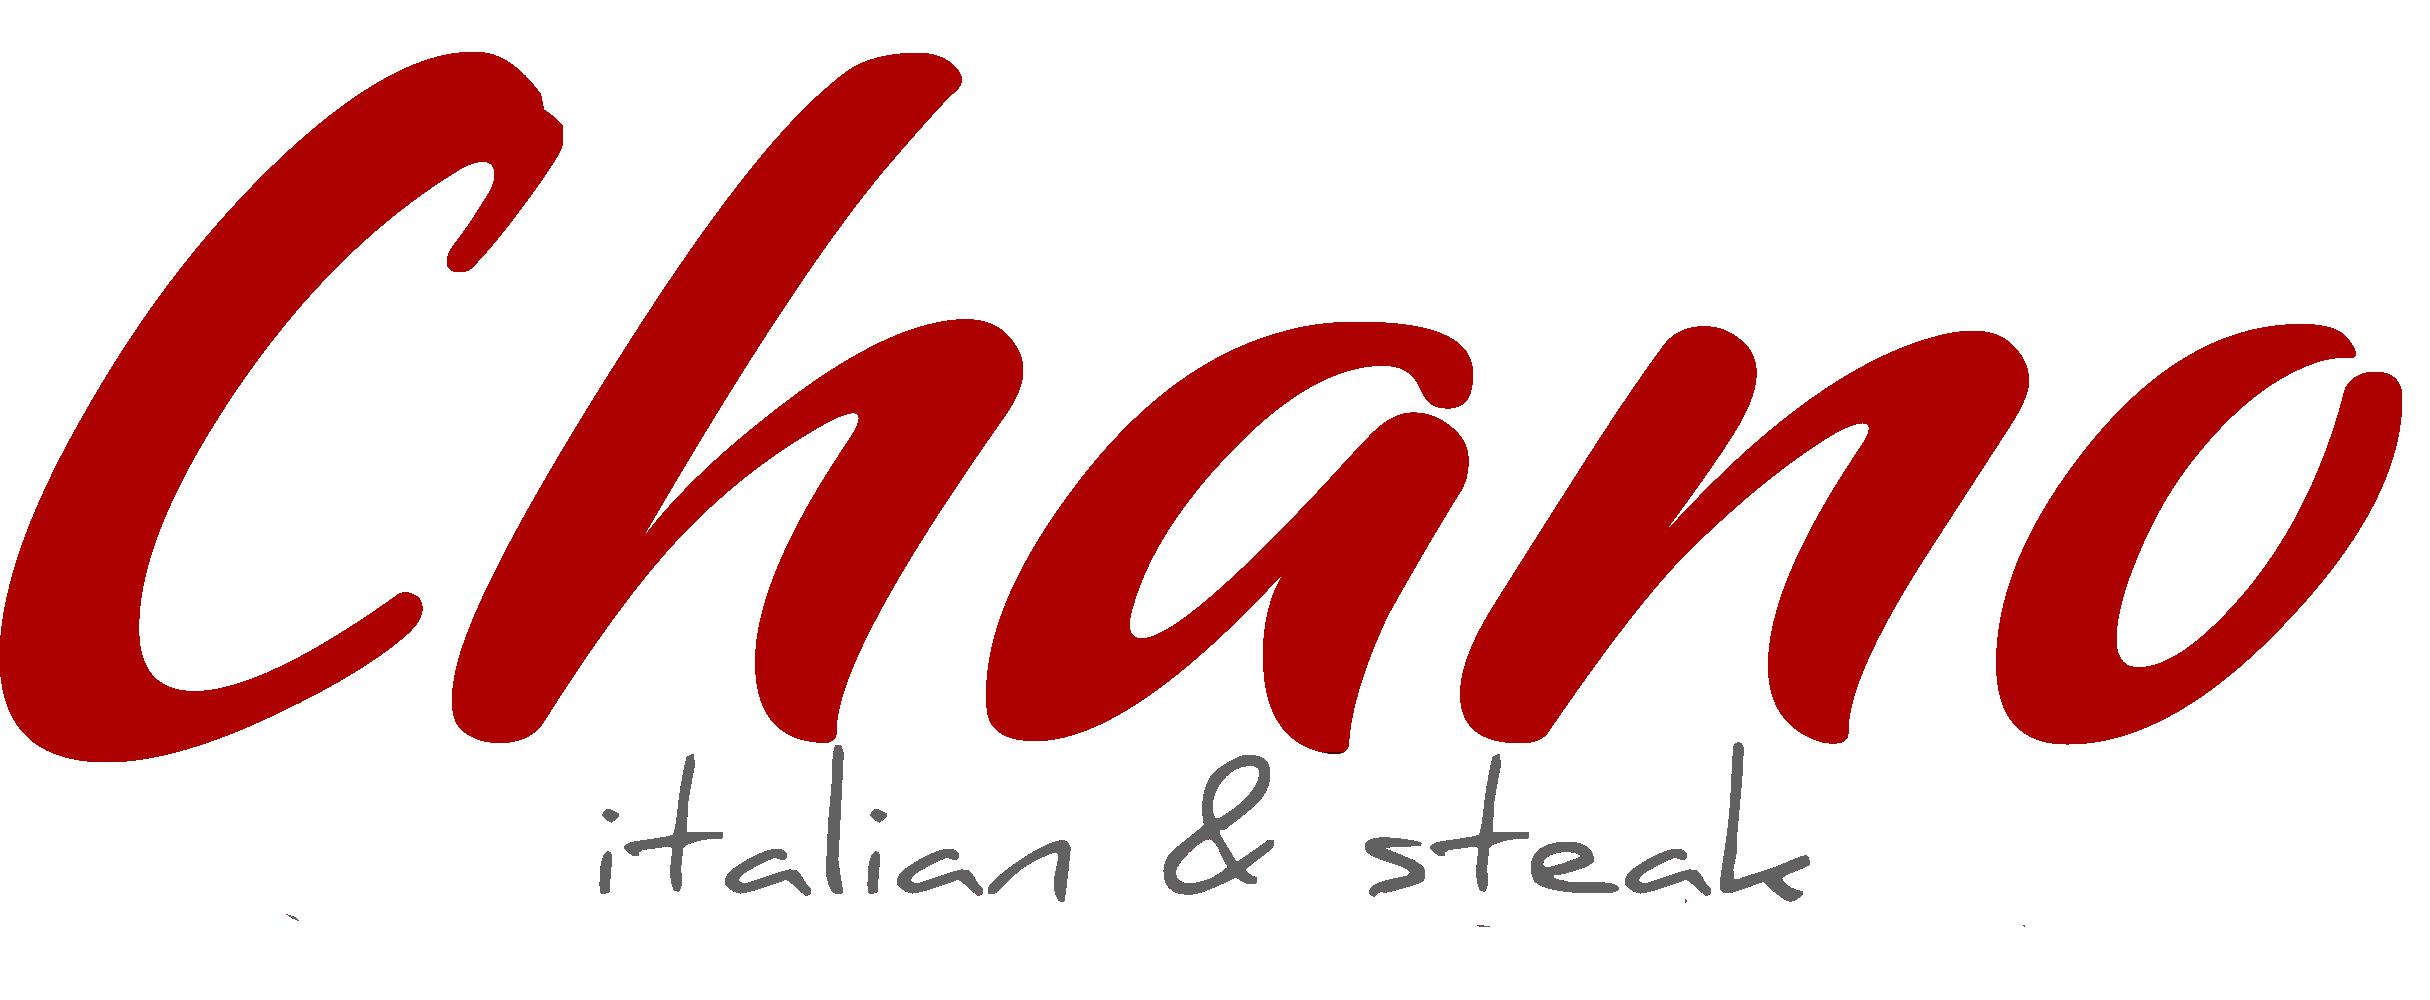 Chano Logo